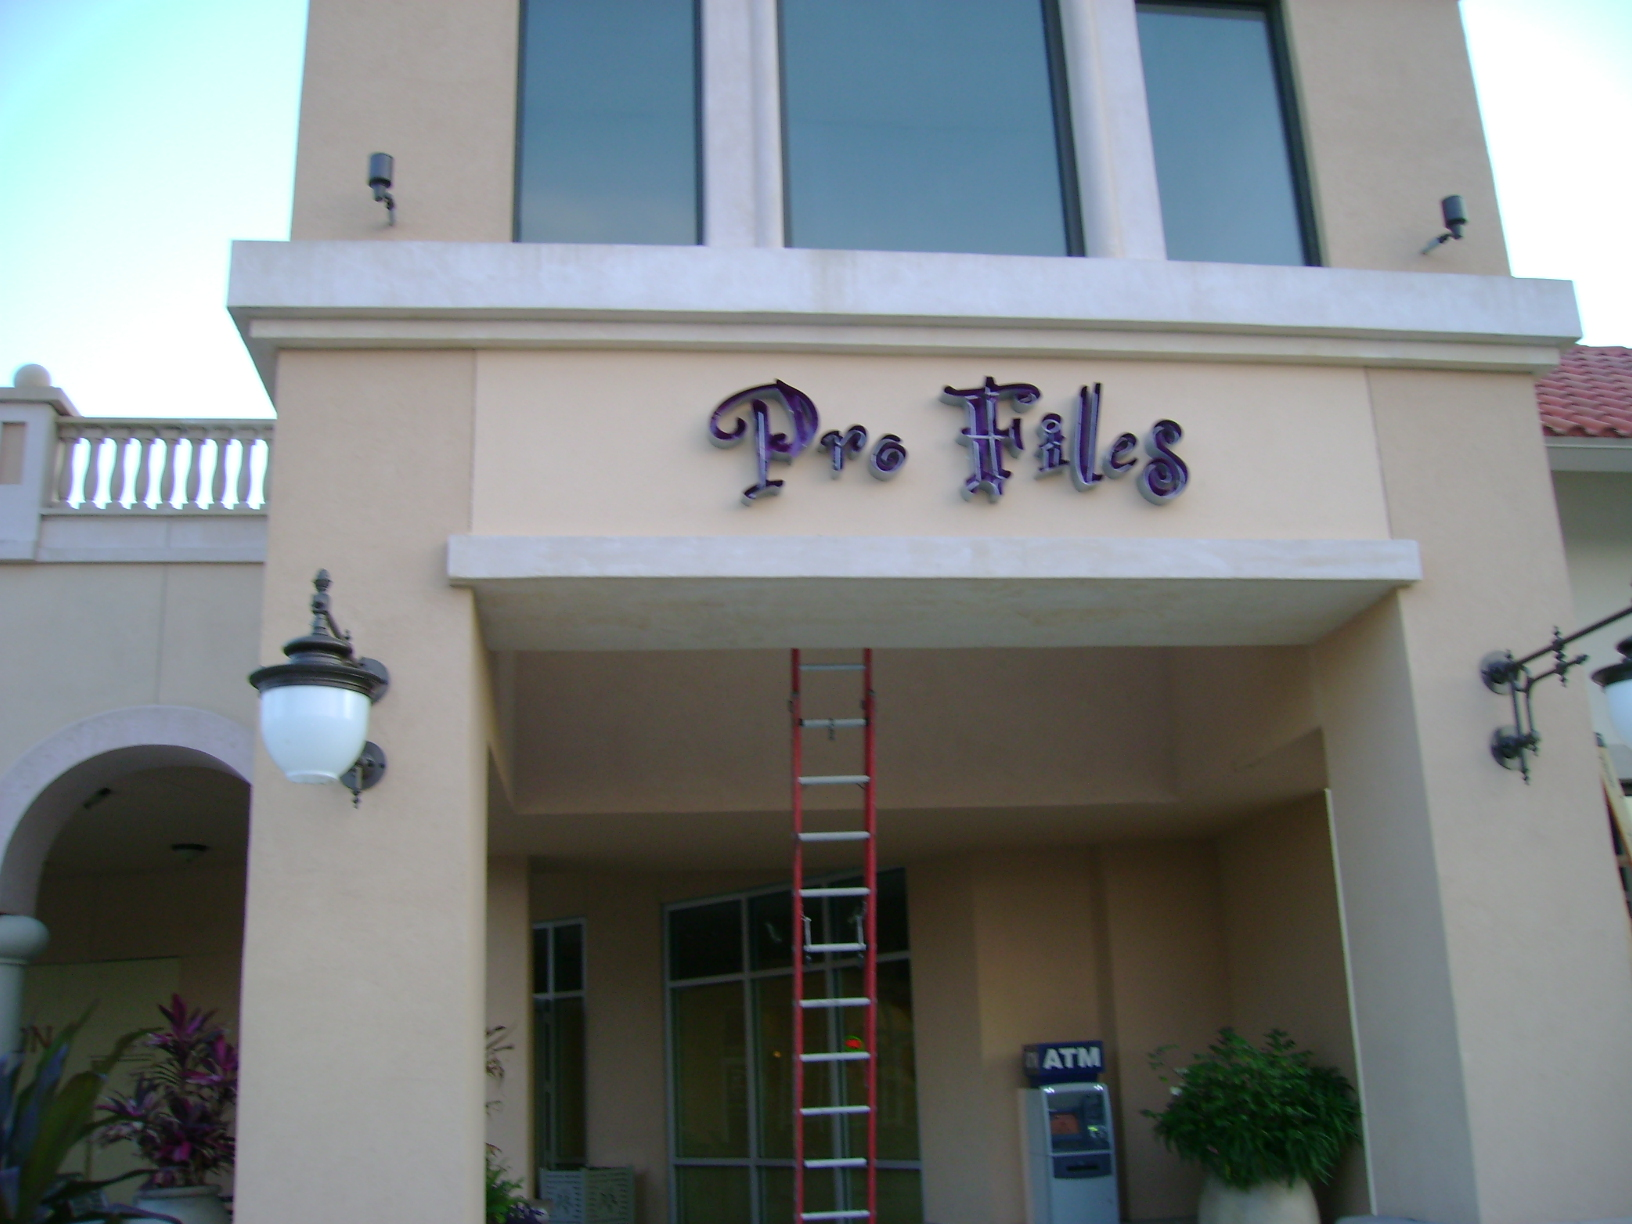 Pro Files, Estero, FL by Lee Designs